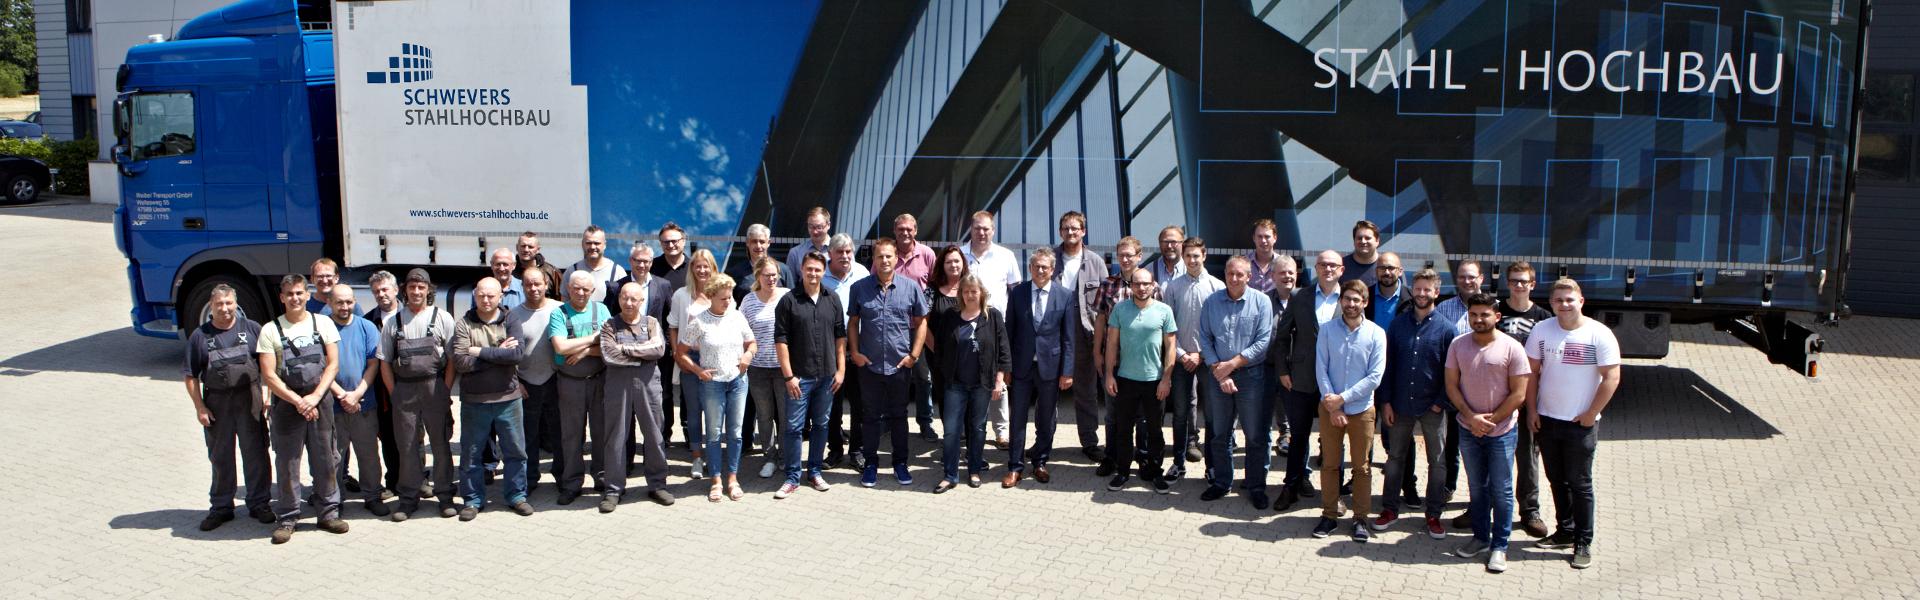 Schwevers Stahlhochbau Team Über uns